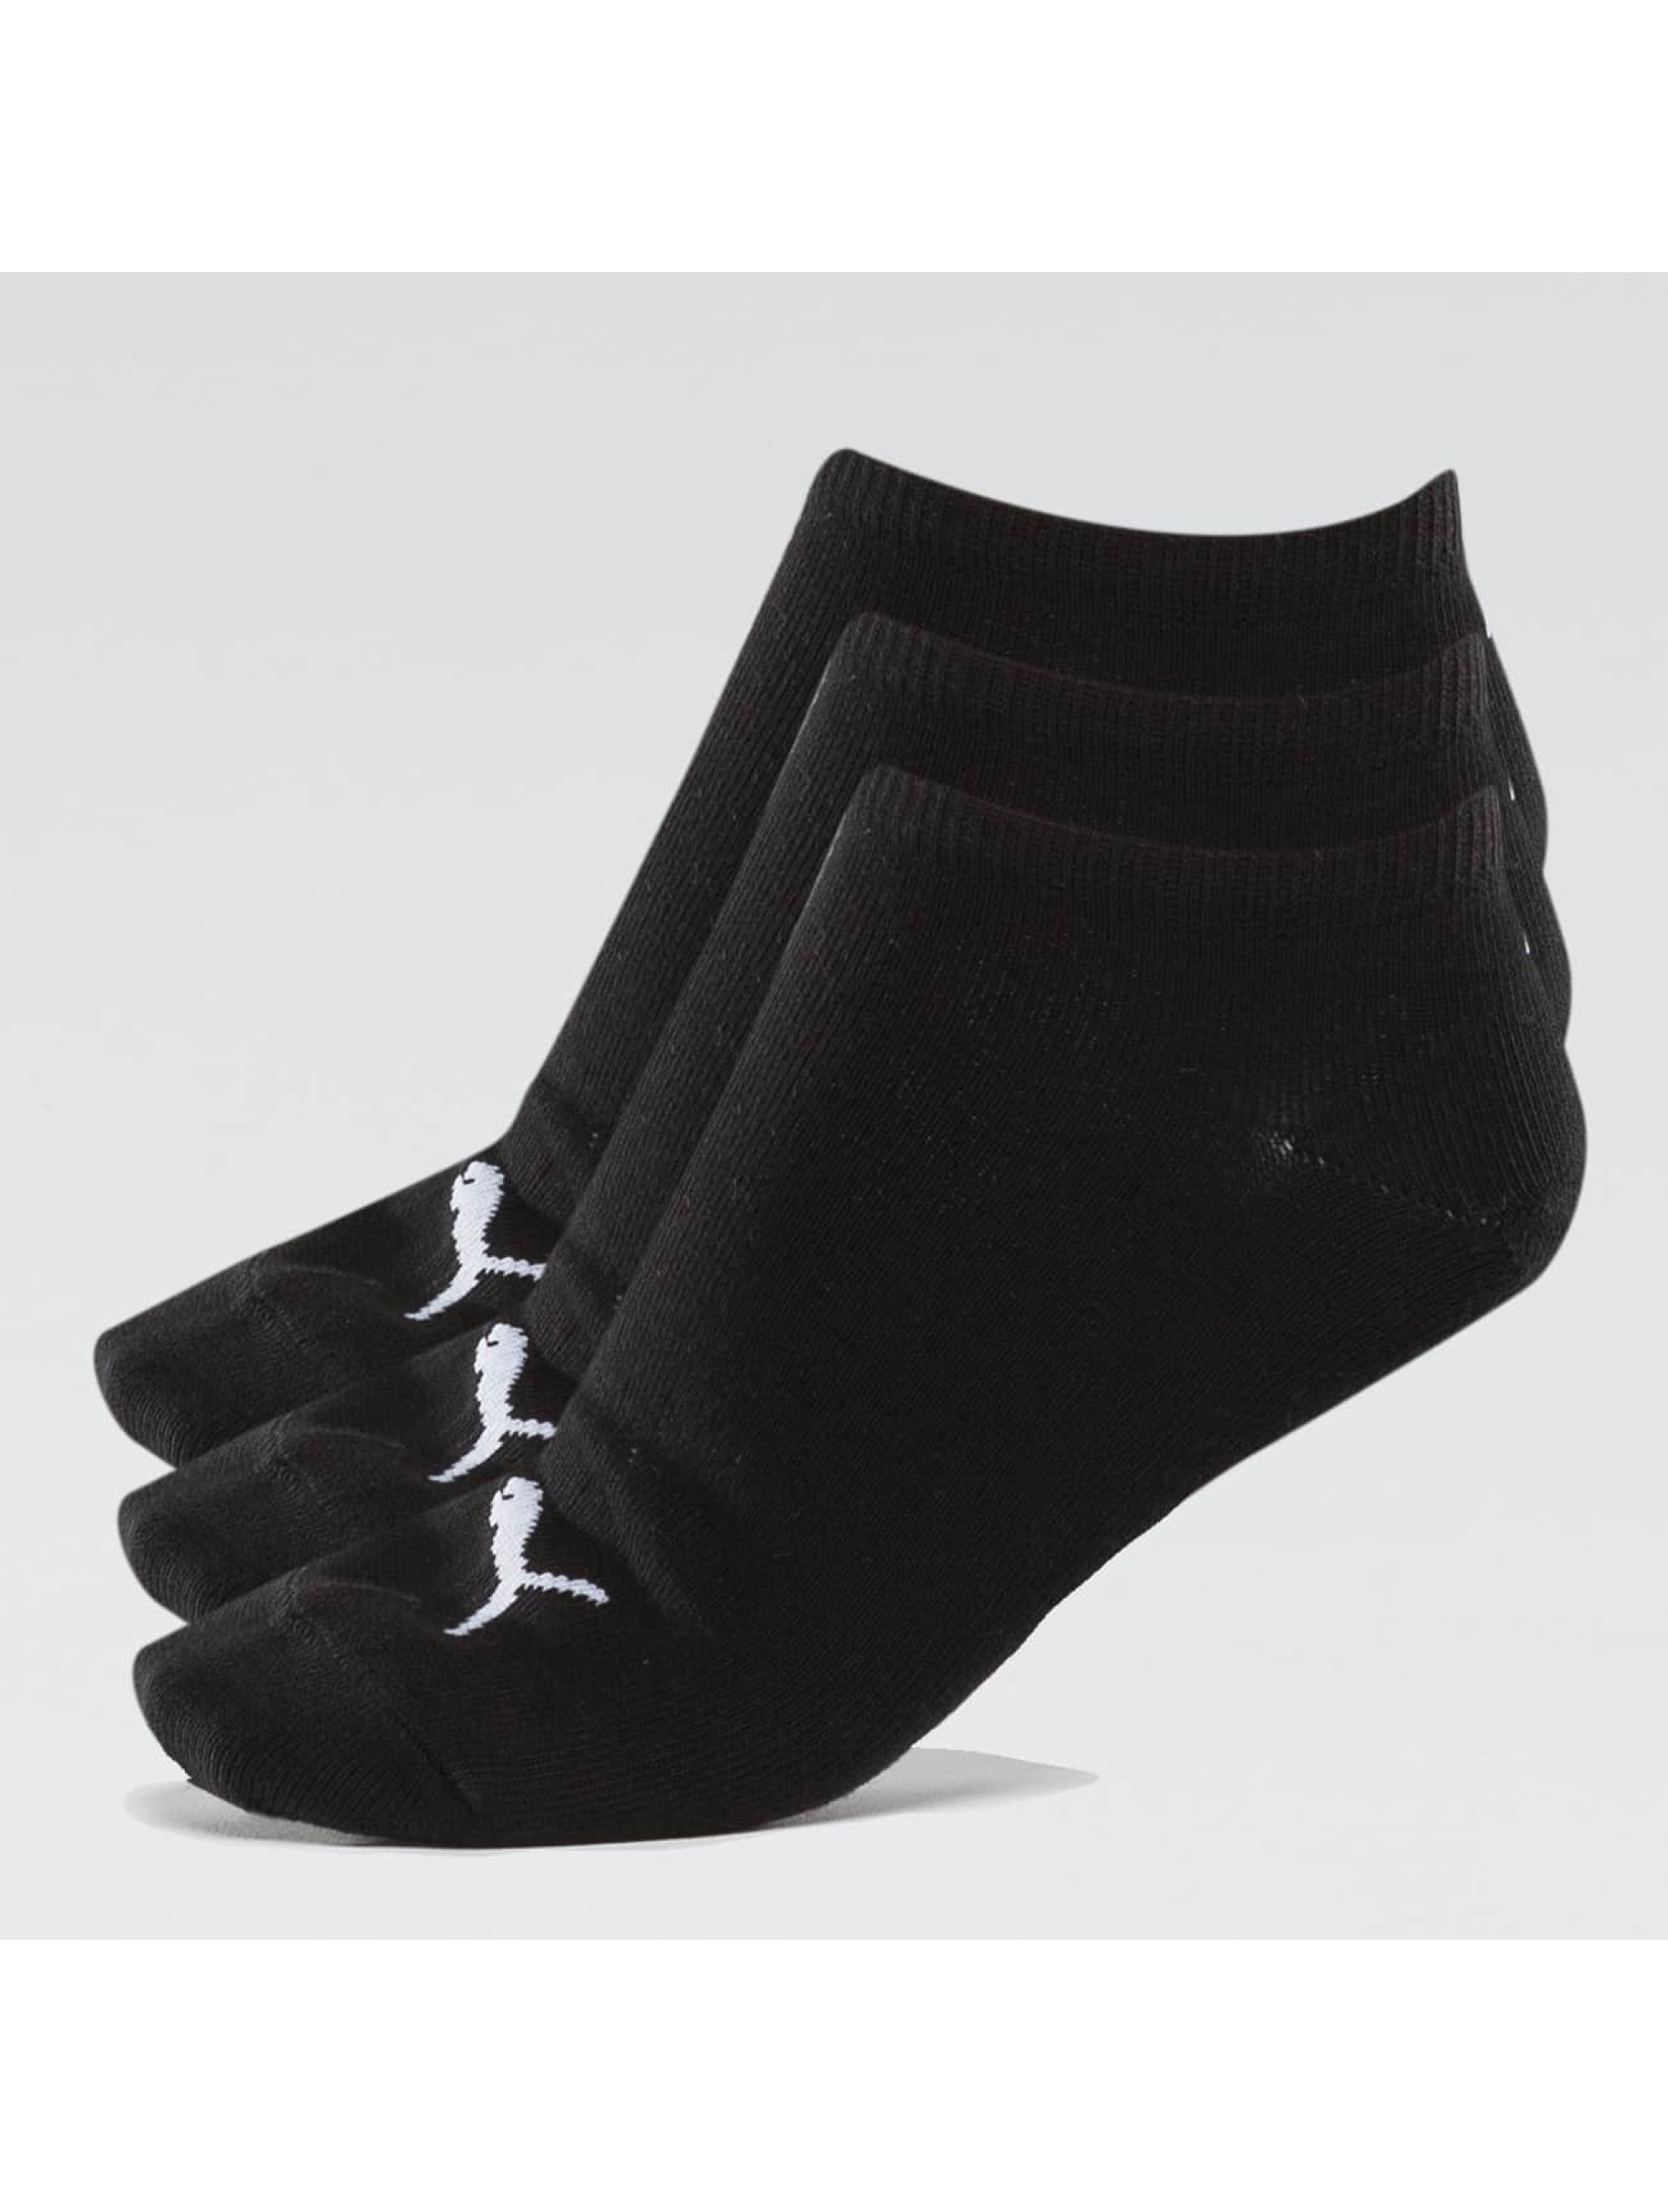 Puma Chaussettes 3-Pack Sneakers noir